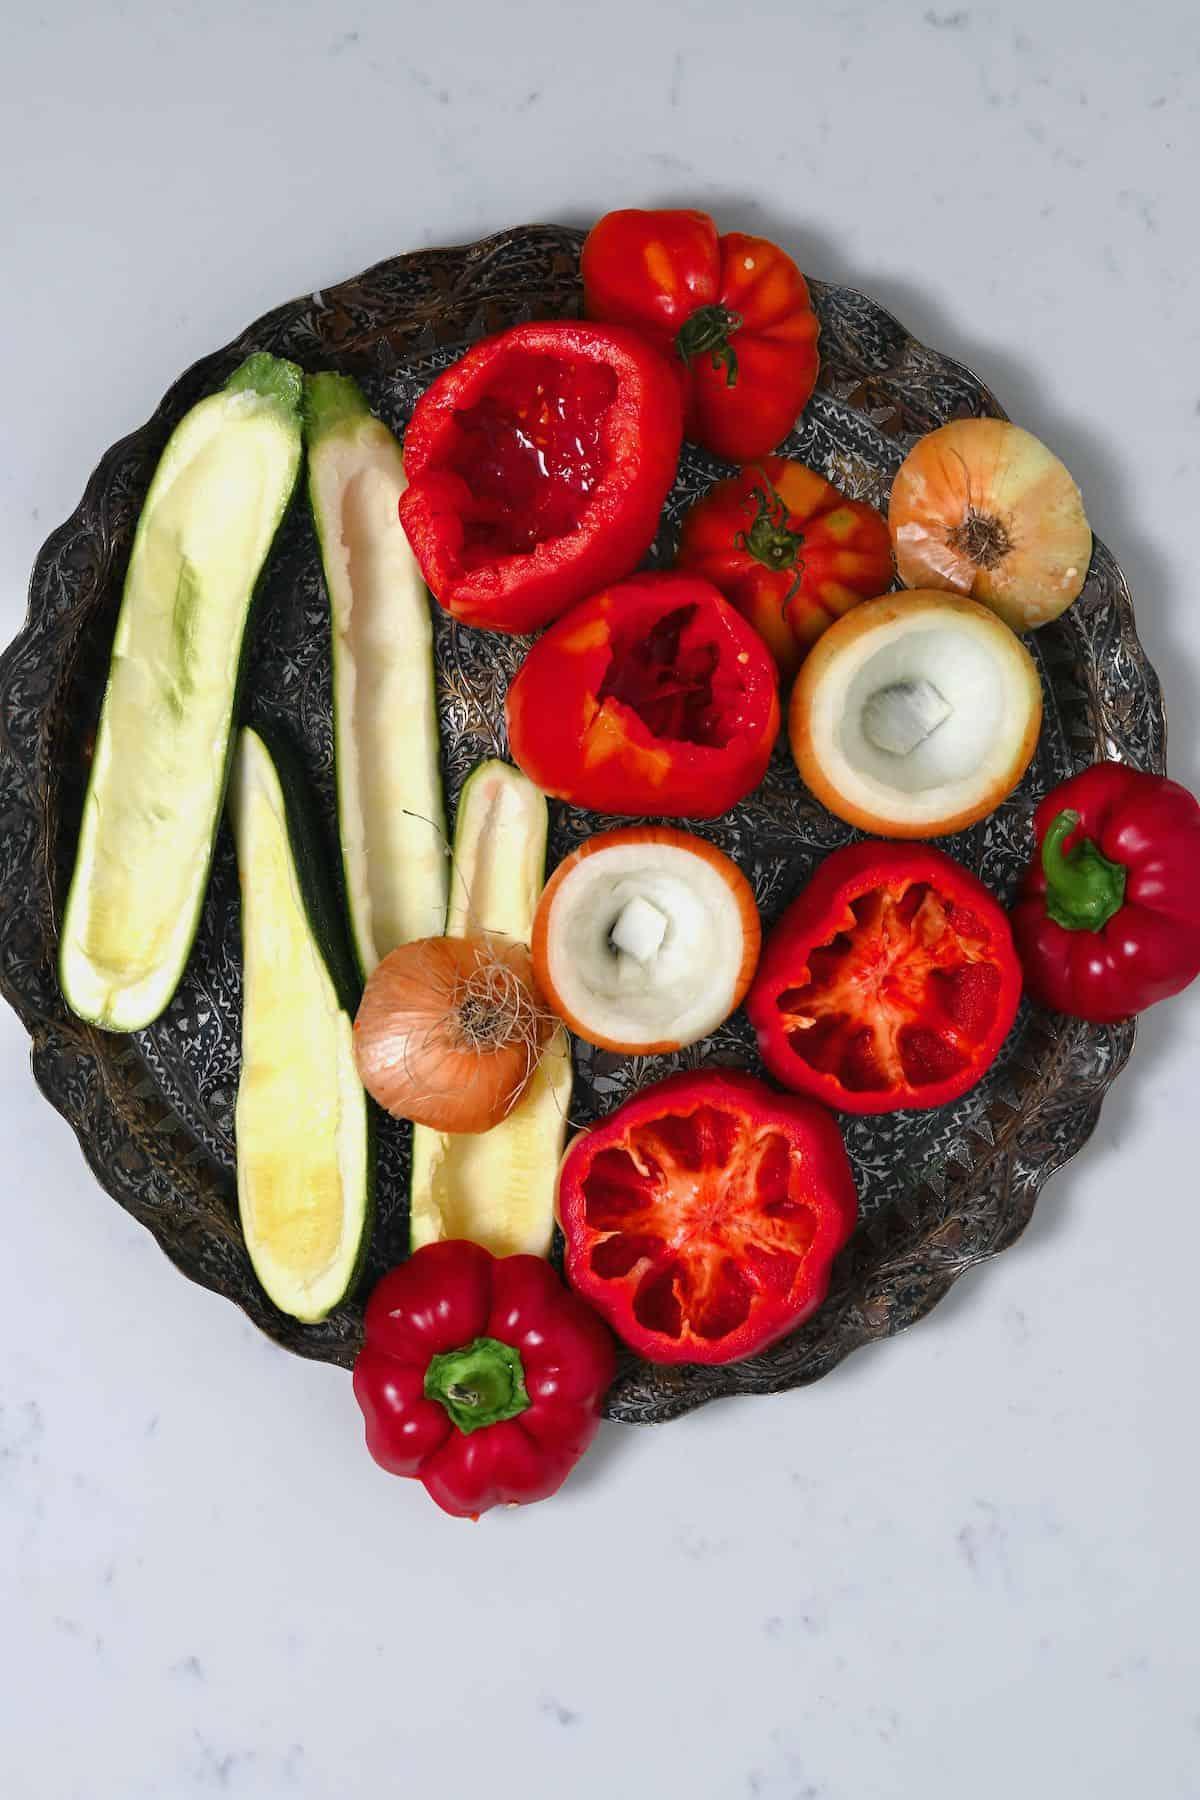 Cored mixed veggies on a platter